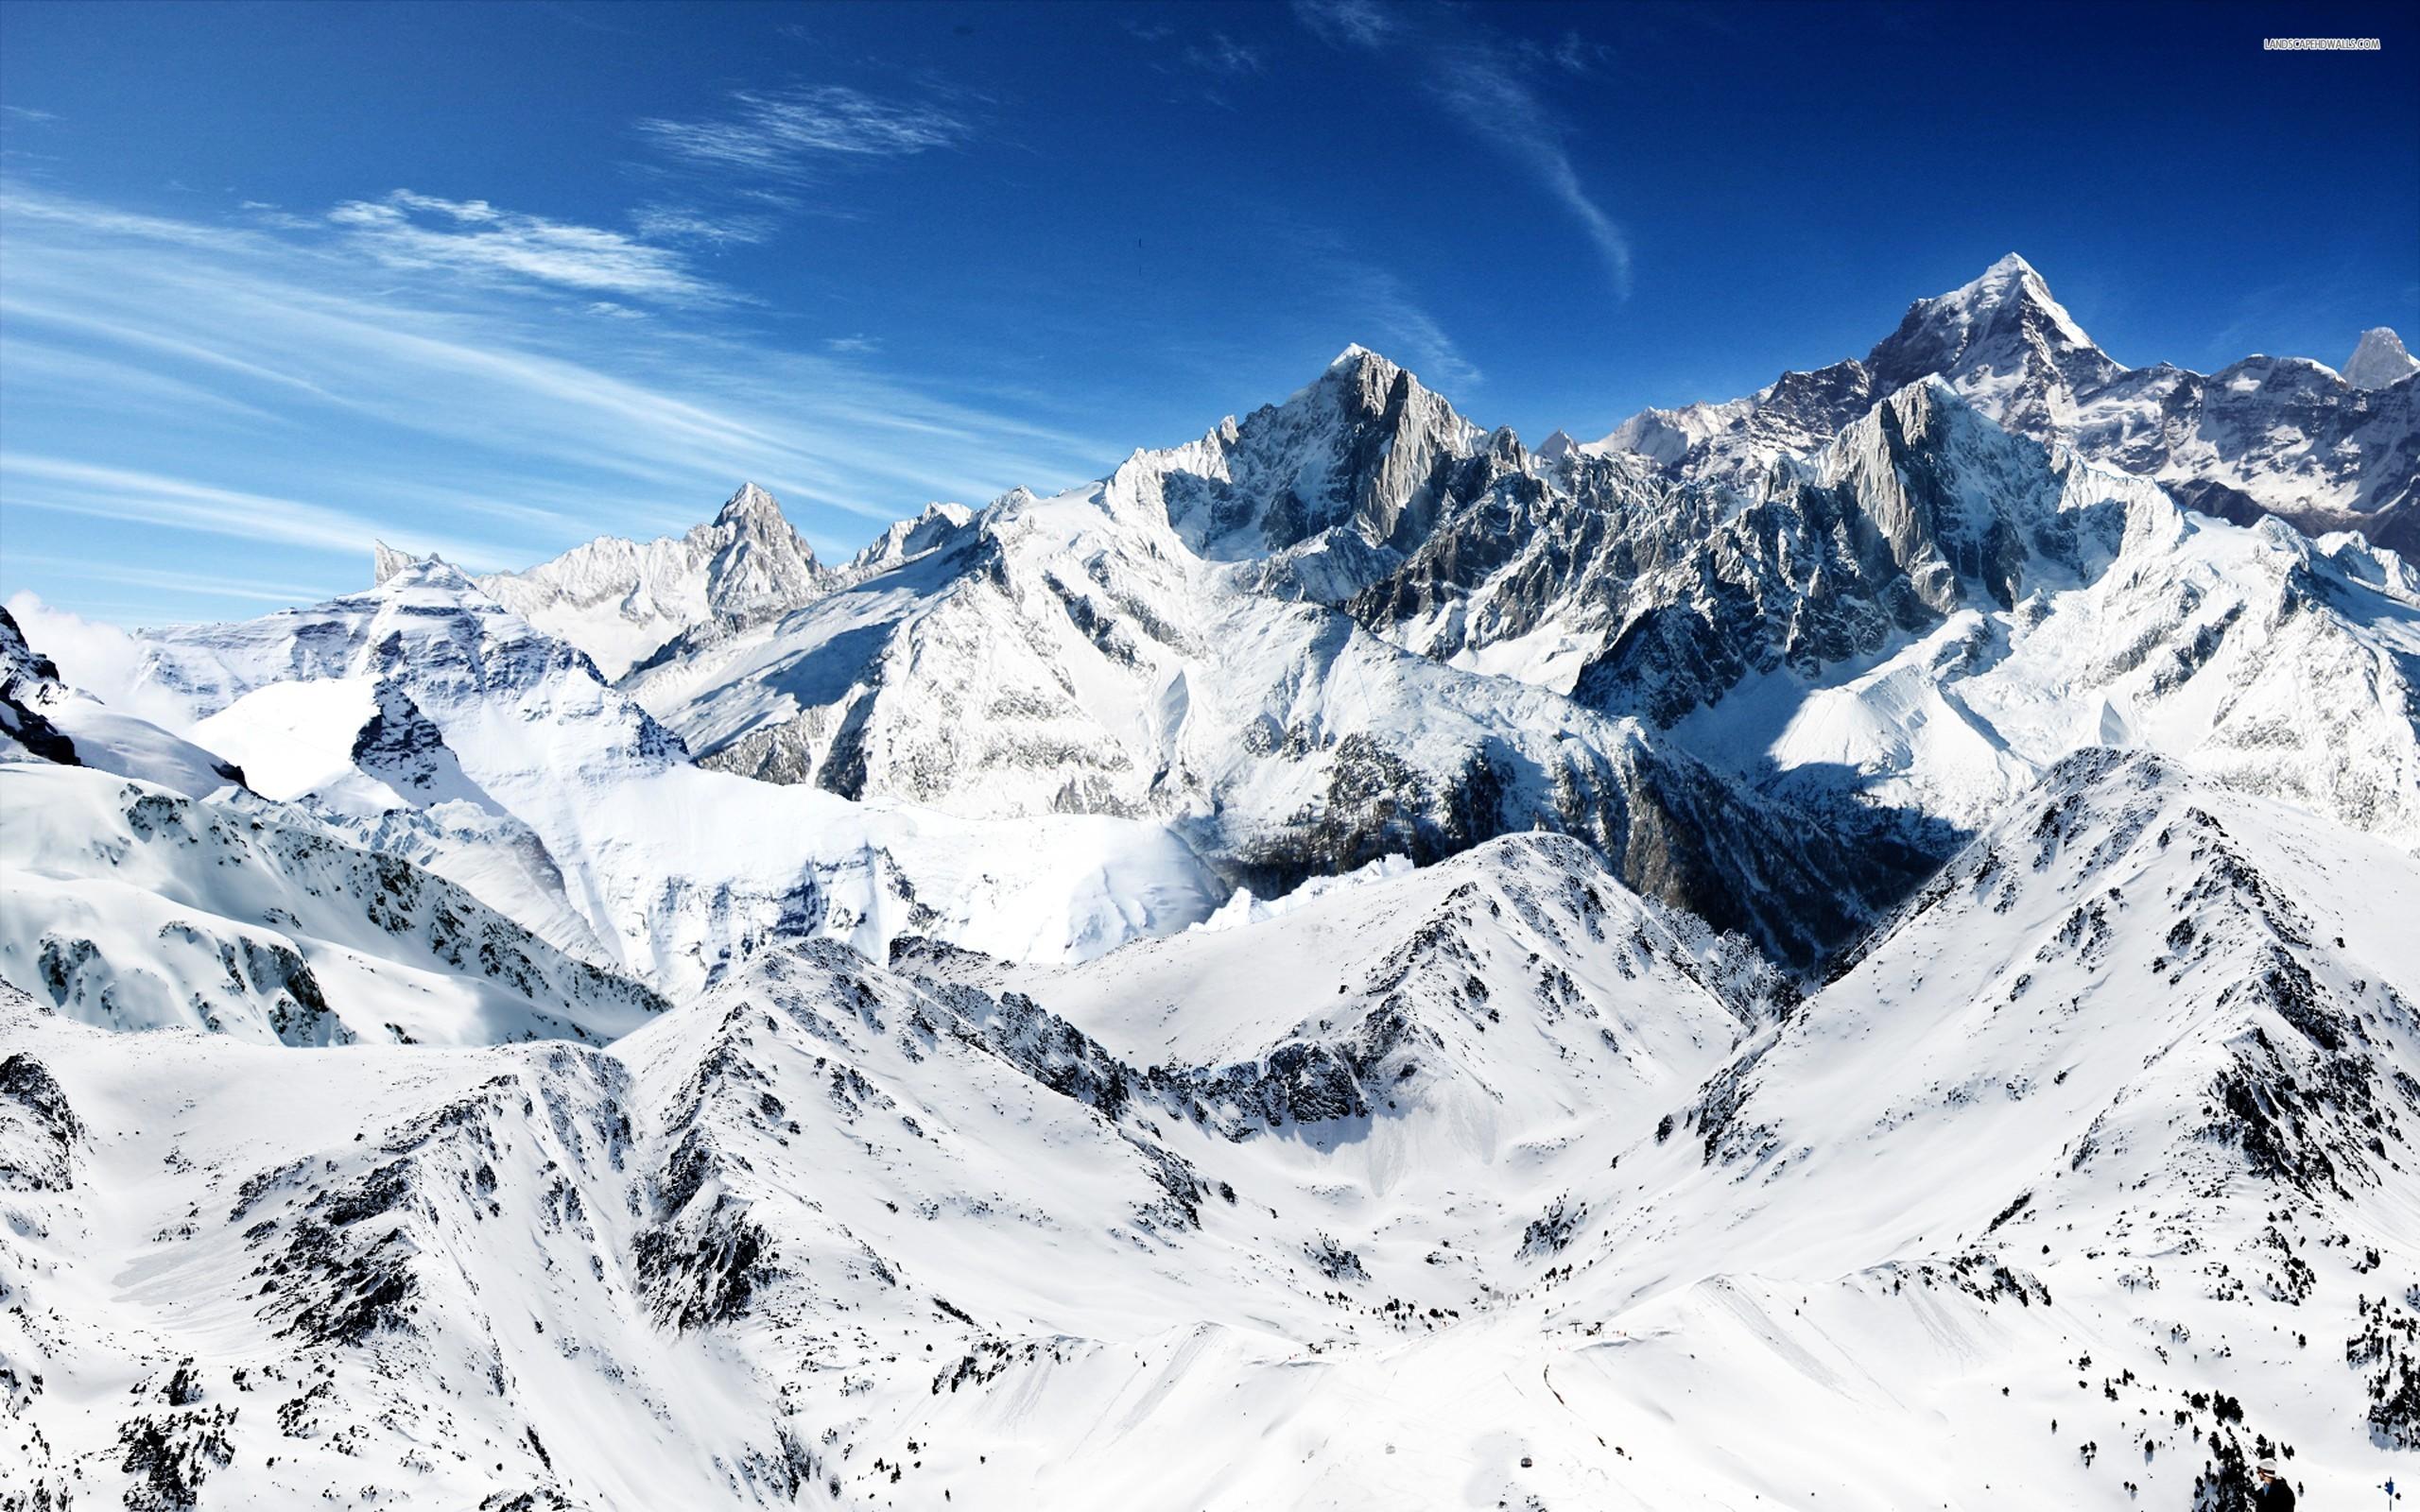 Beautiful Snow Mountain Wallpaper for Desktop